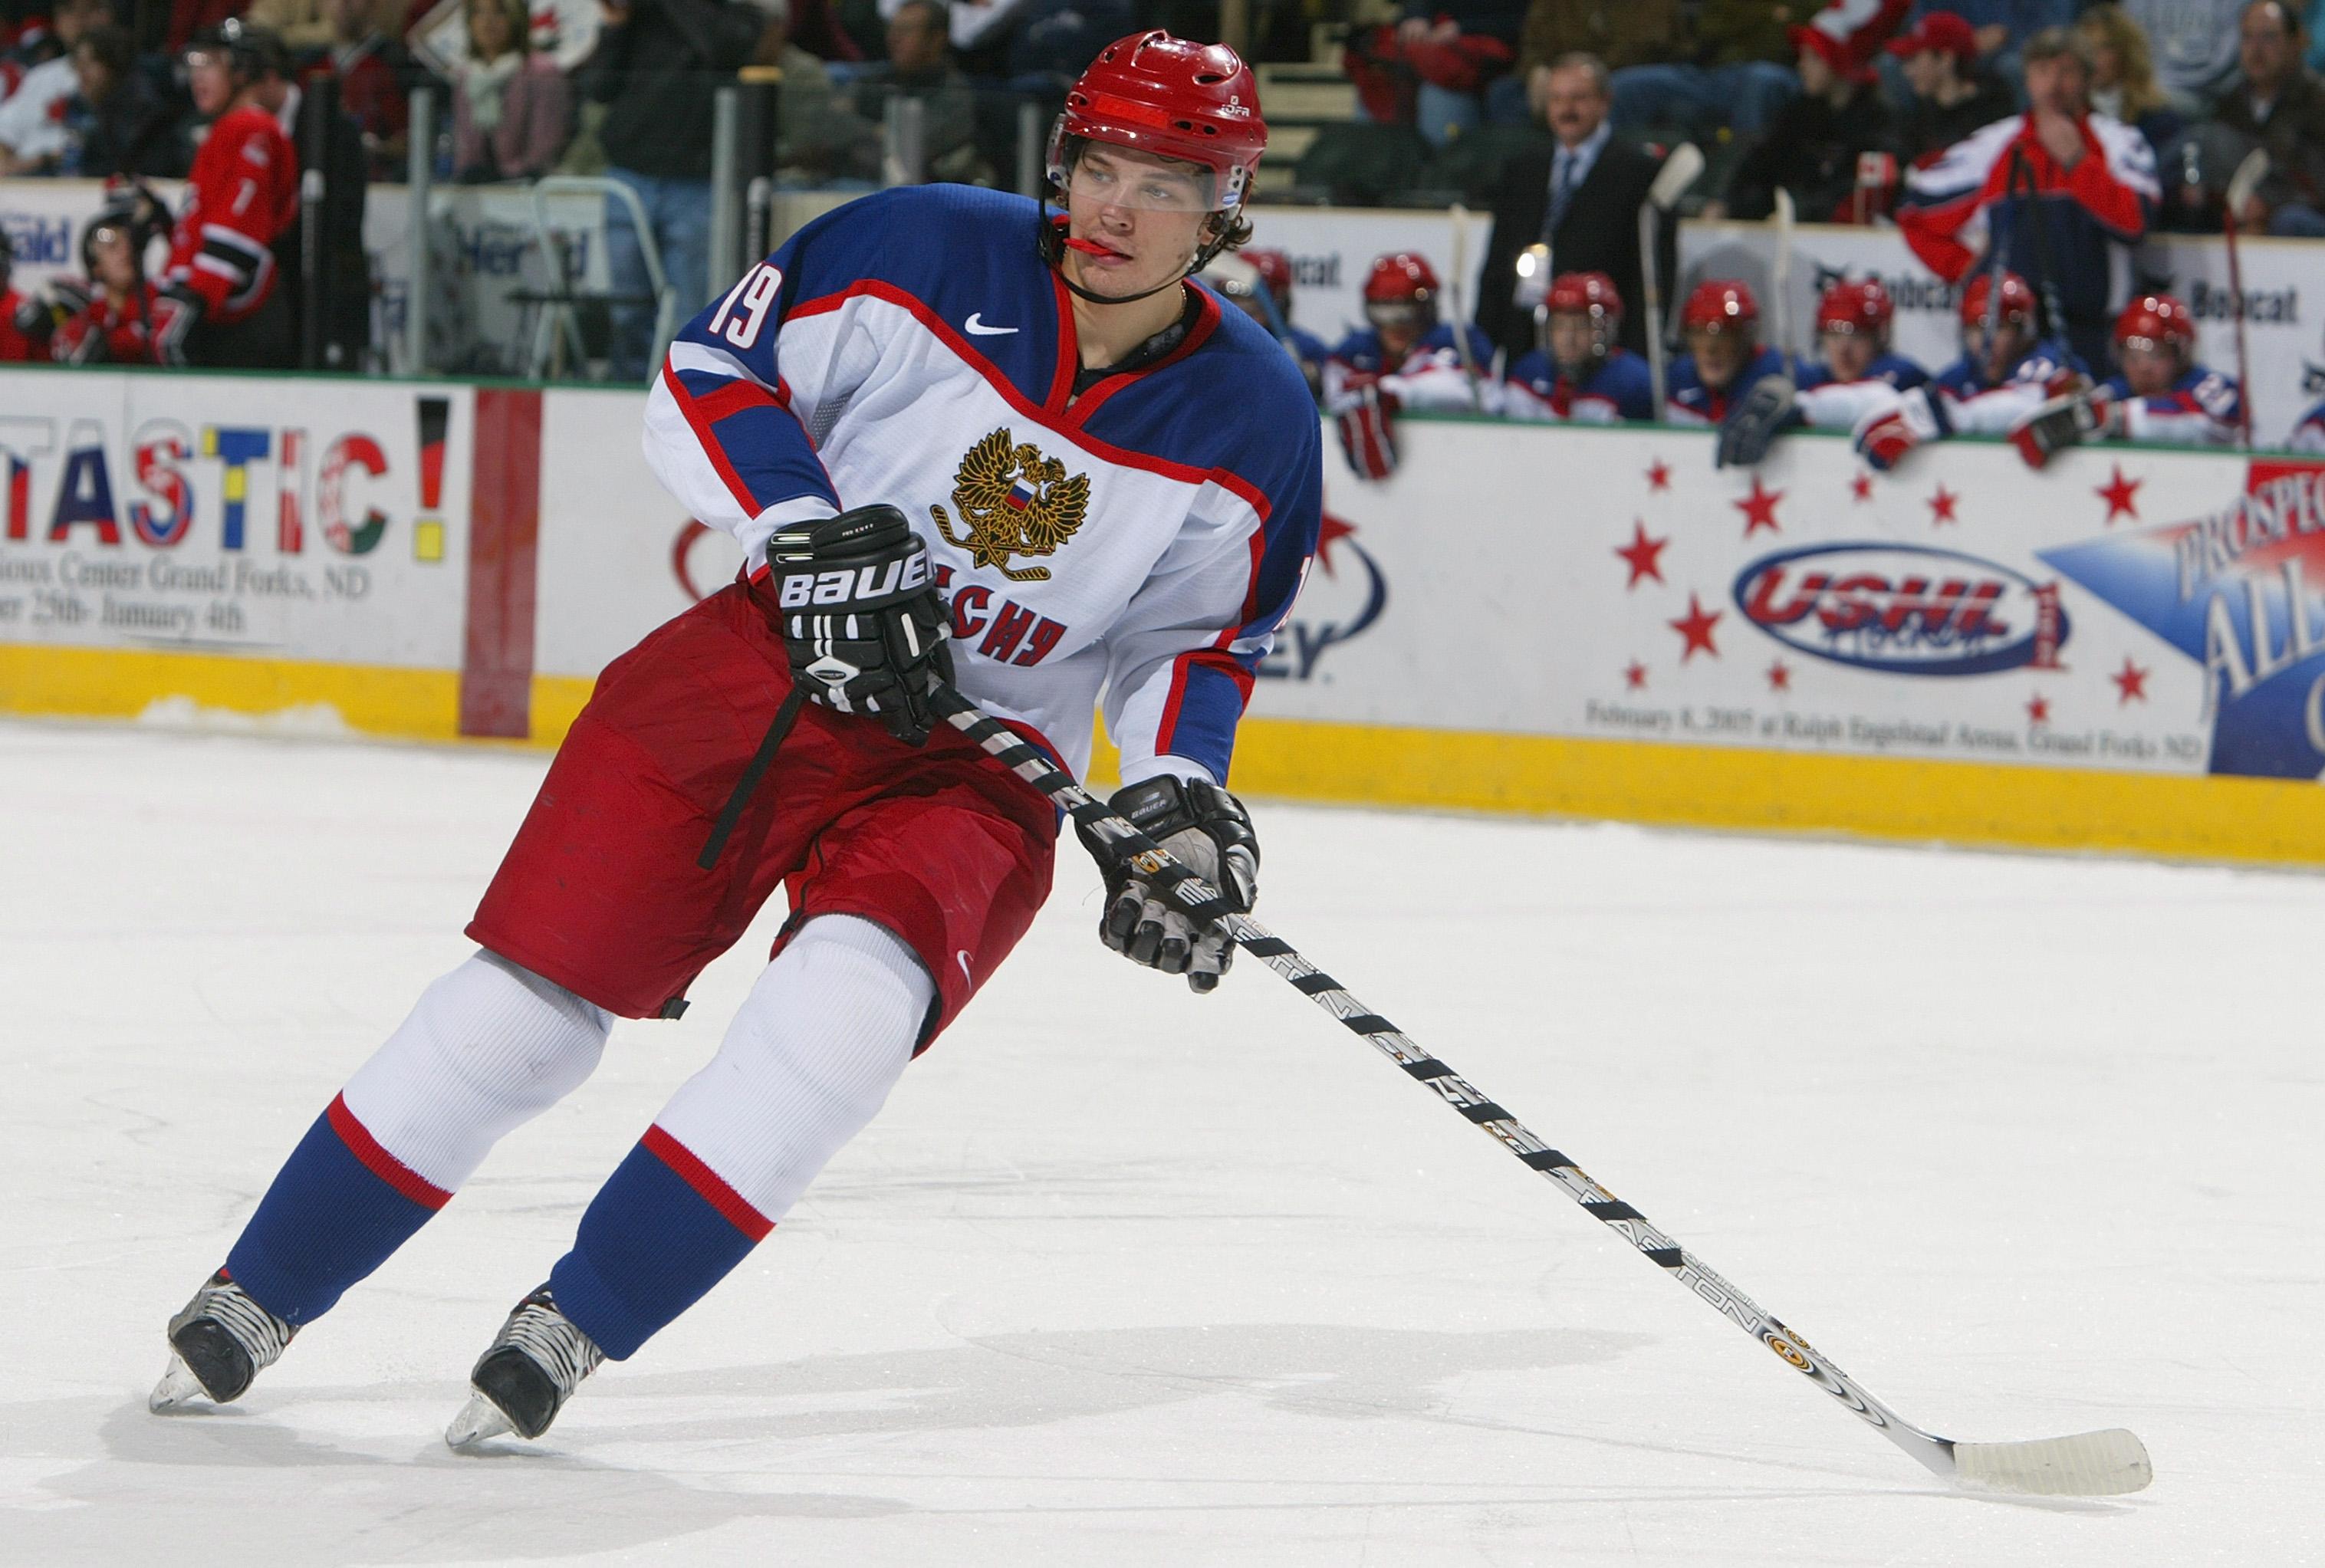 World Jr. Hockey: Russia v Canada